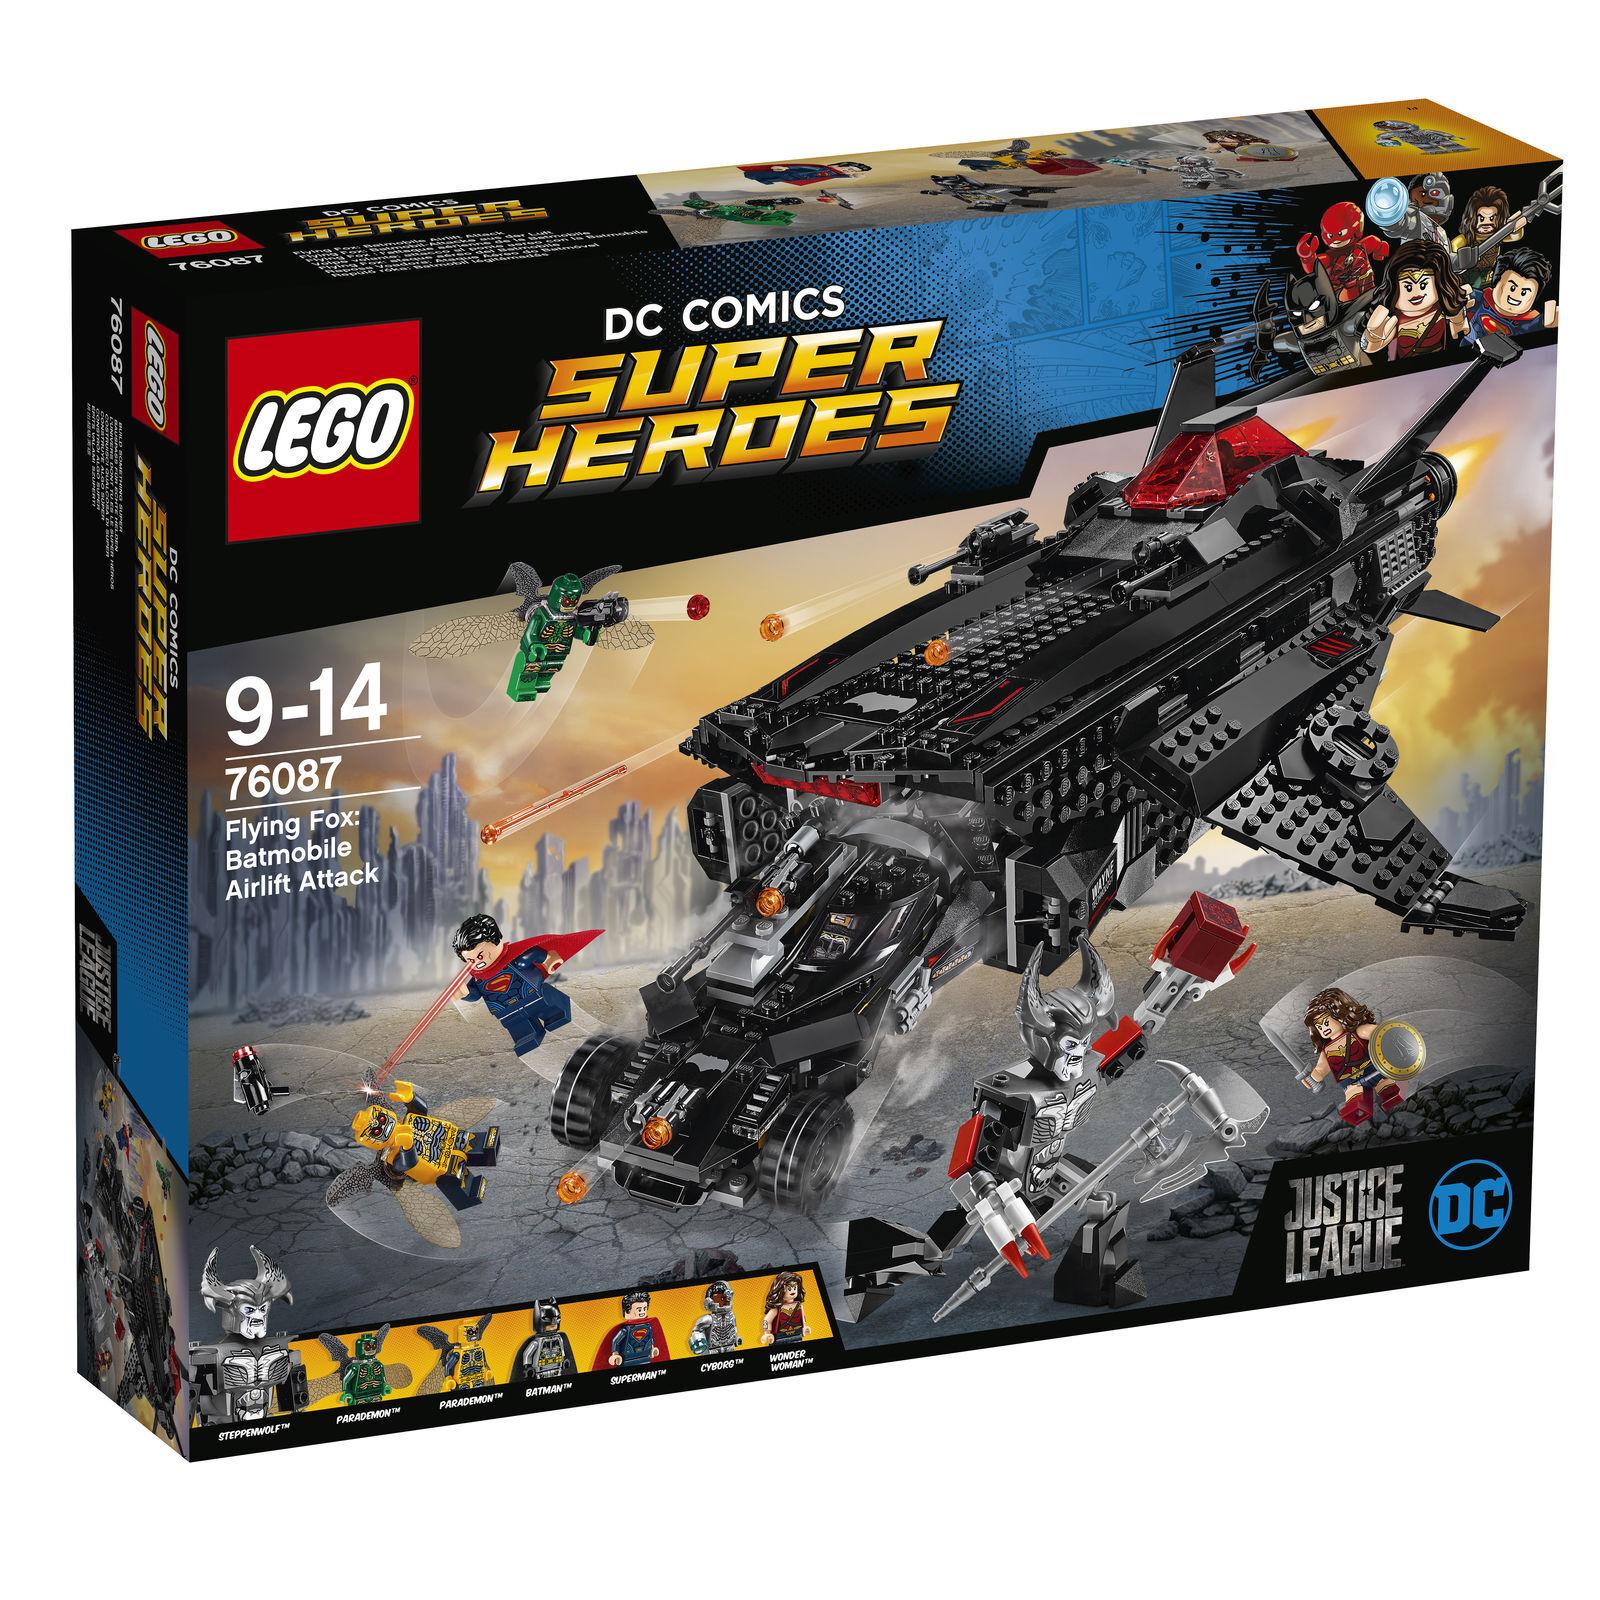 LEGO DC Universe Super Heroes - Flying Flying Flying Fox Batmobil-Attacke (76087) - Neu & OVP c400c6